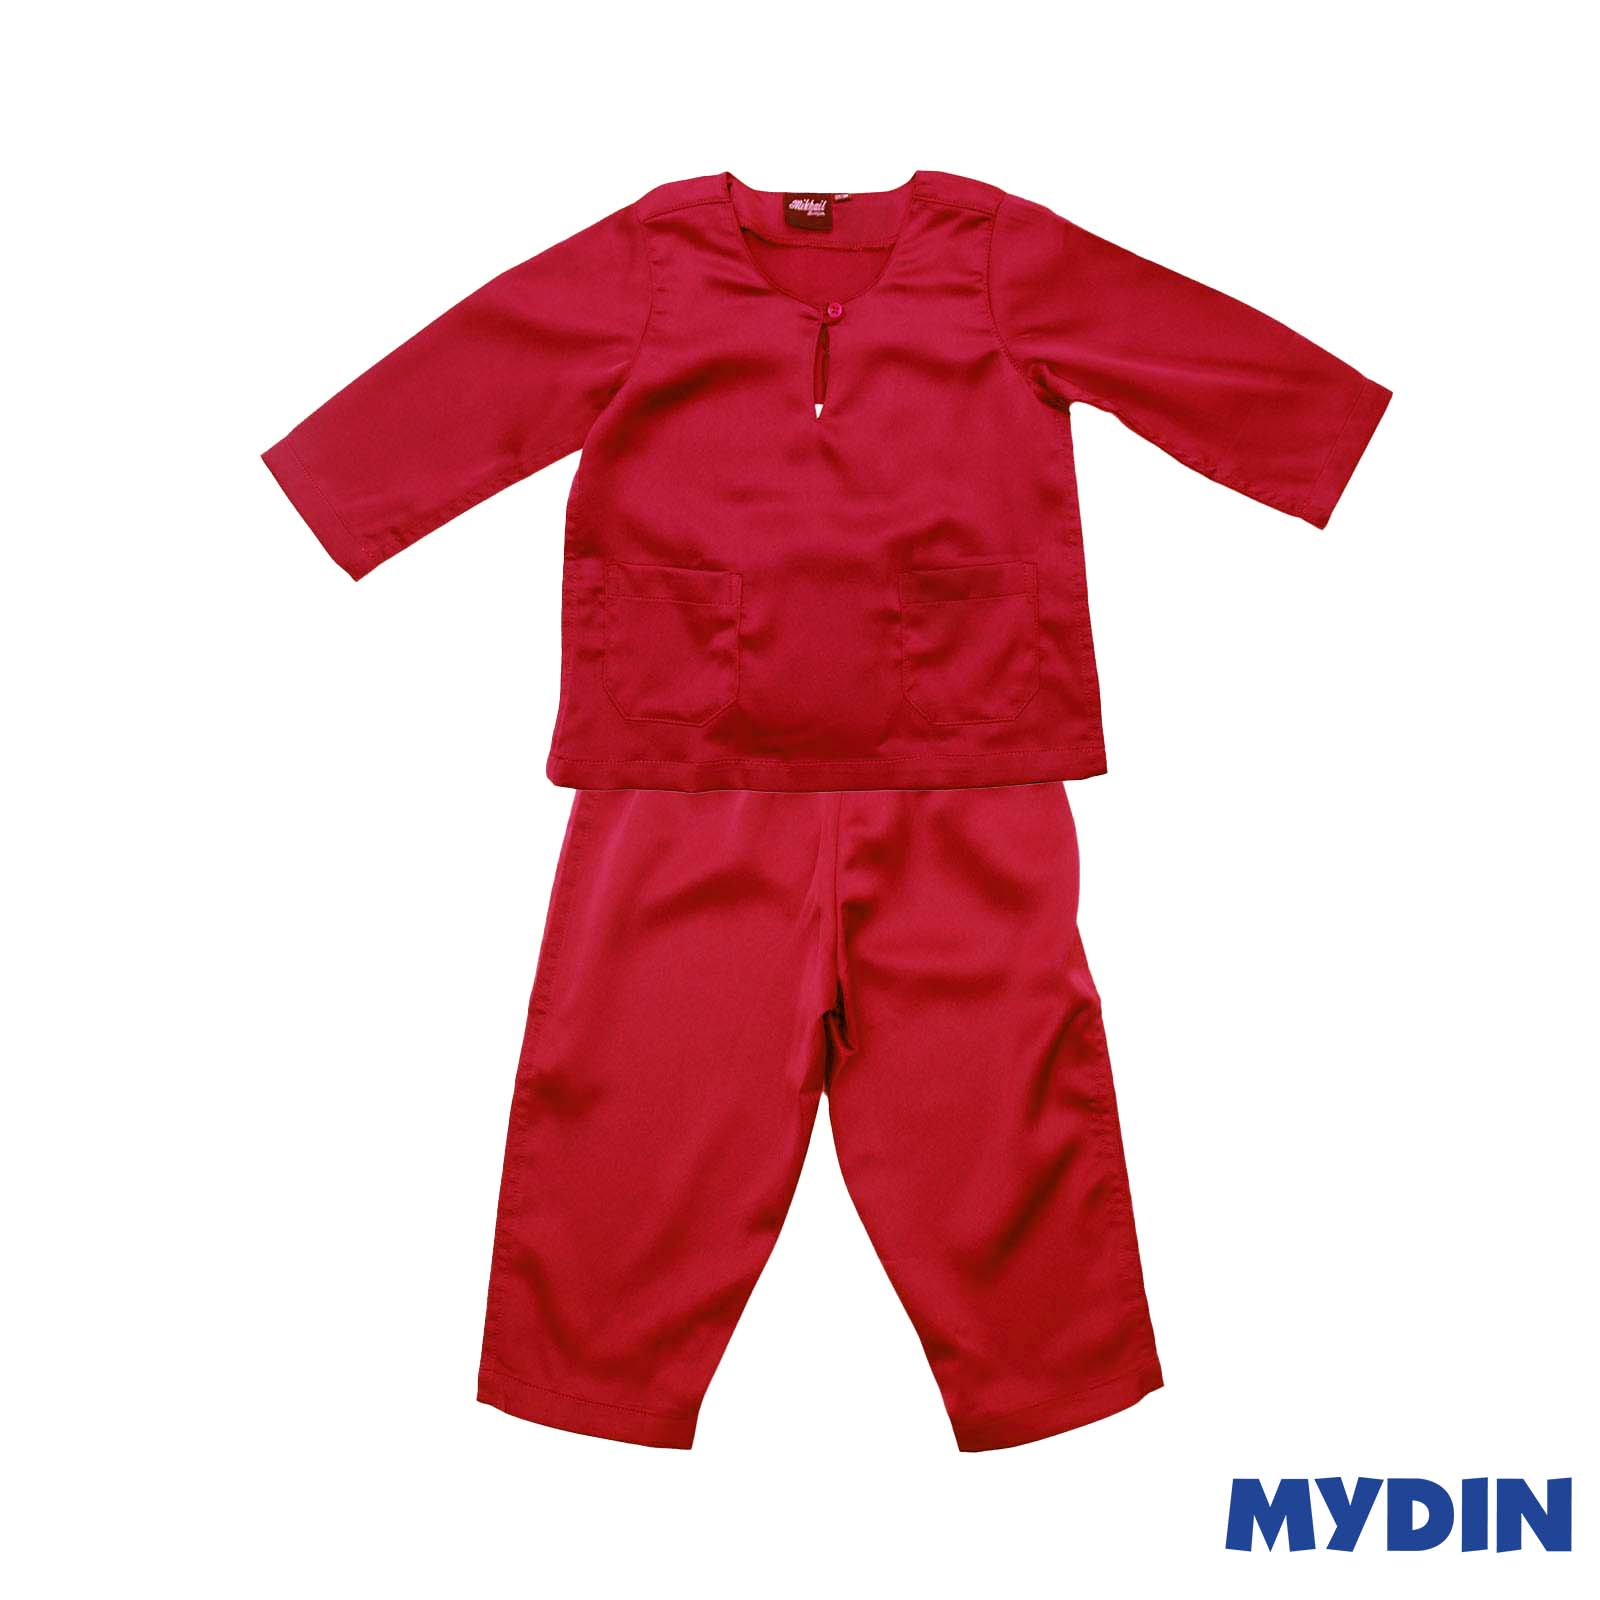 Mikhail Junior Baju Melayu Metalic Sateen Teluk Belanga (Size 6-12) 0819BCW Red